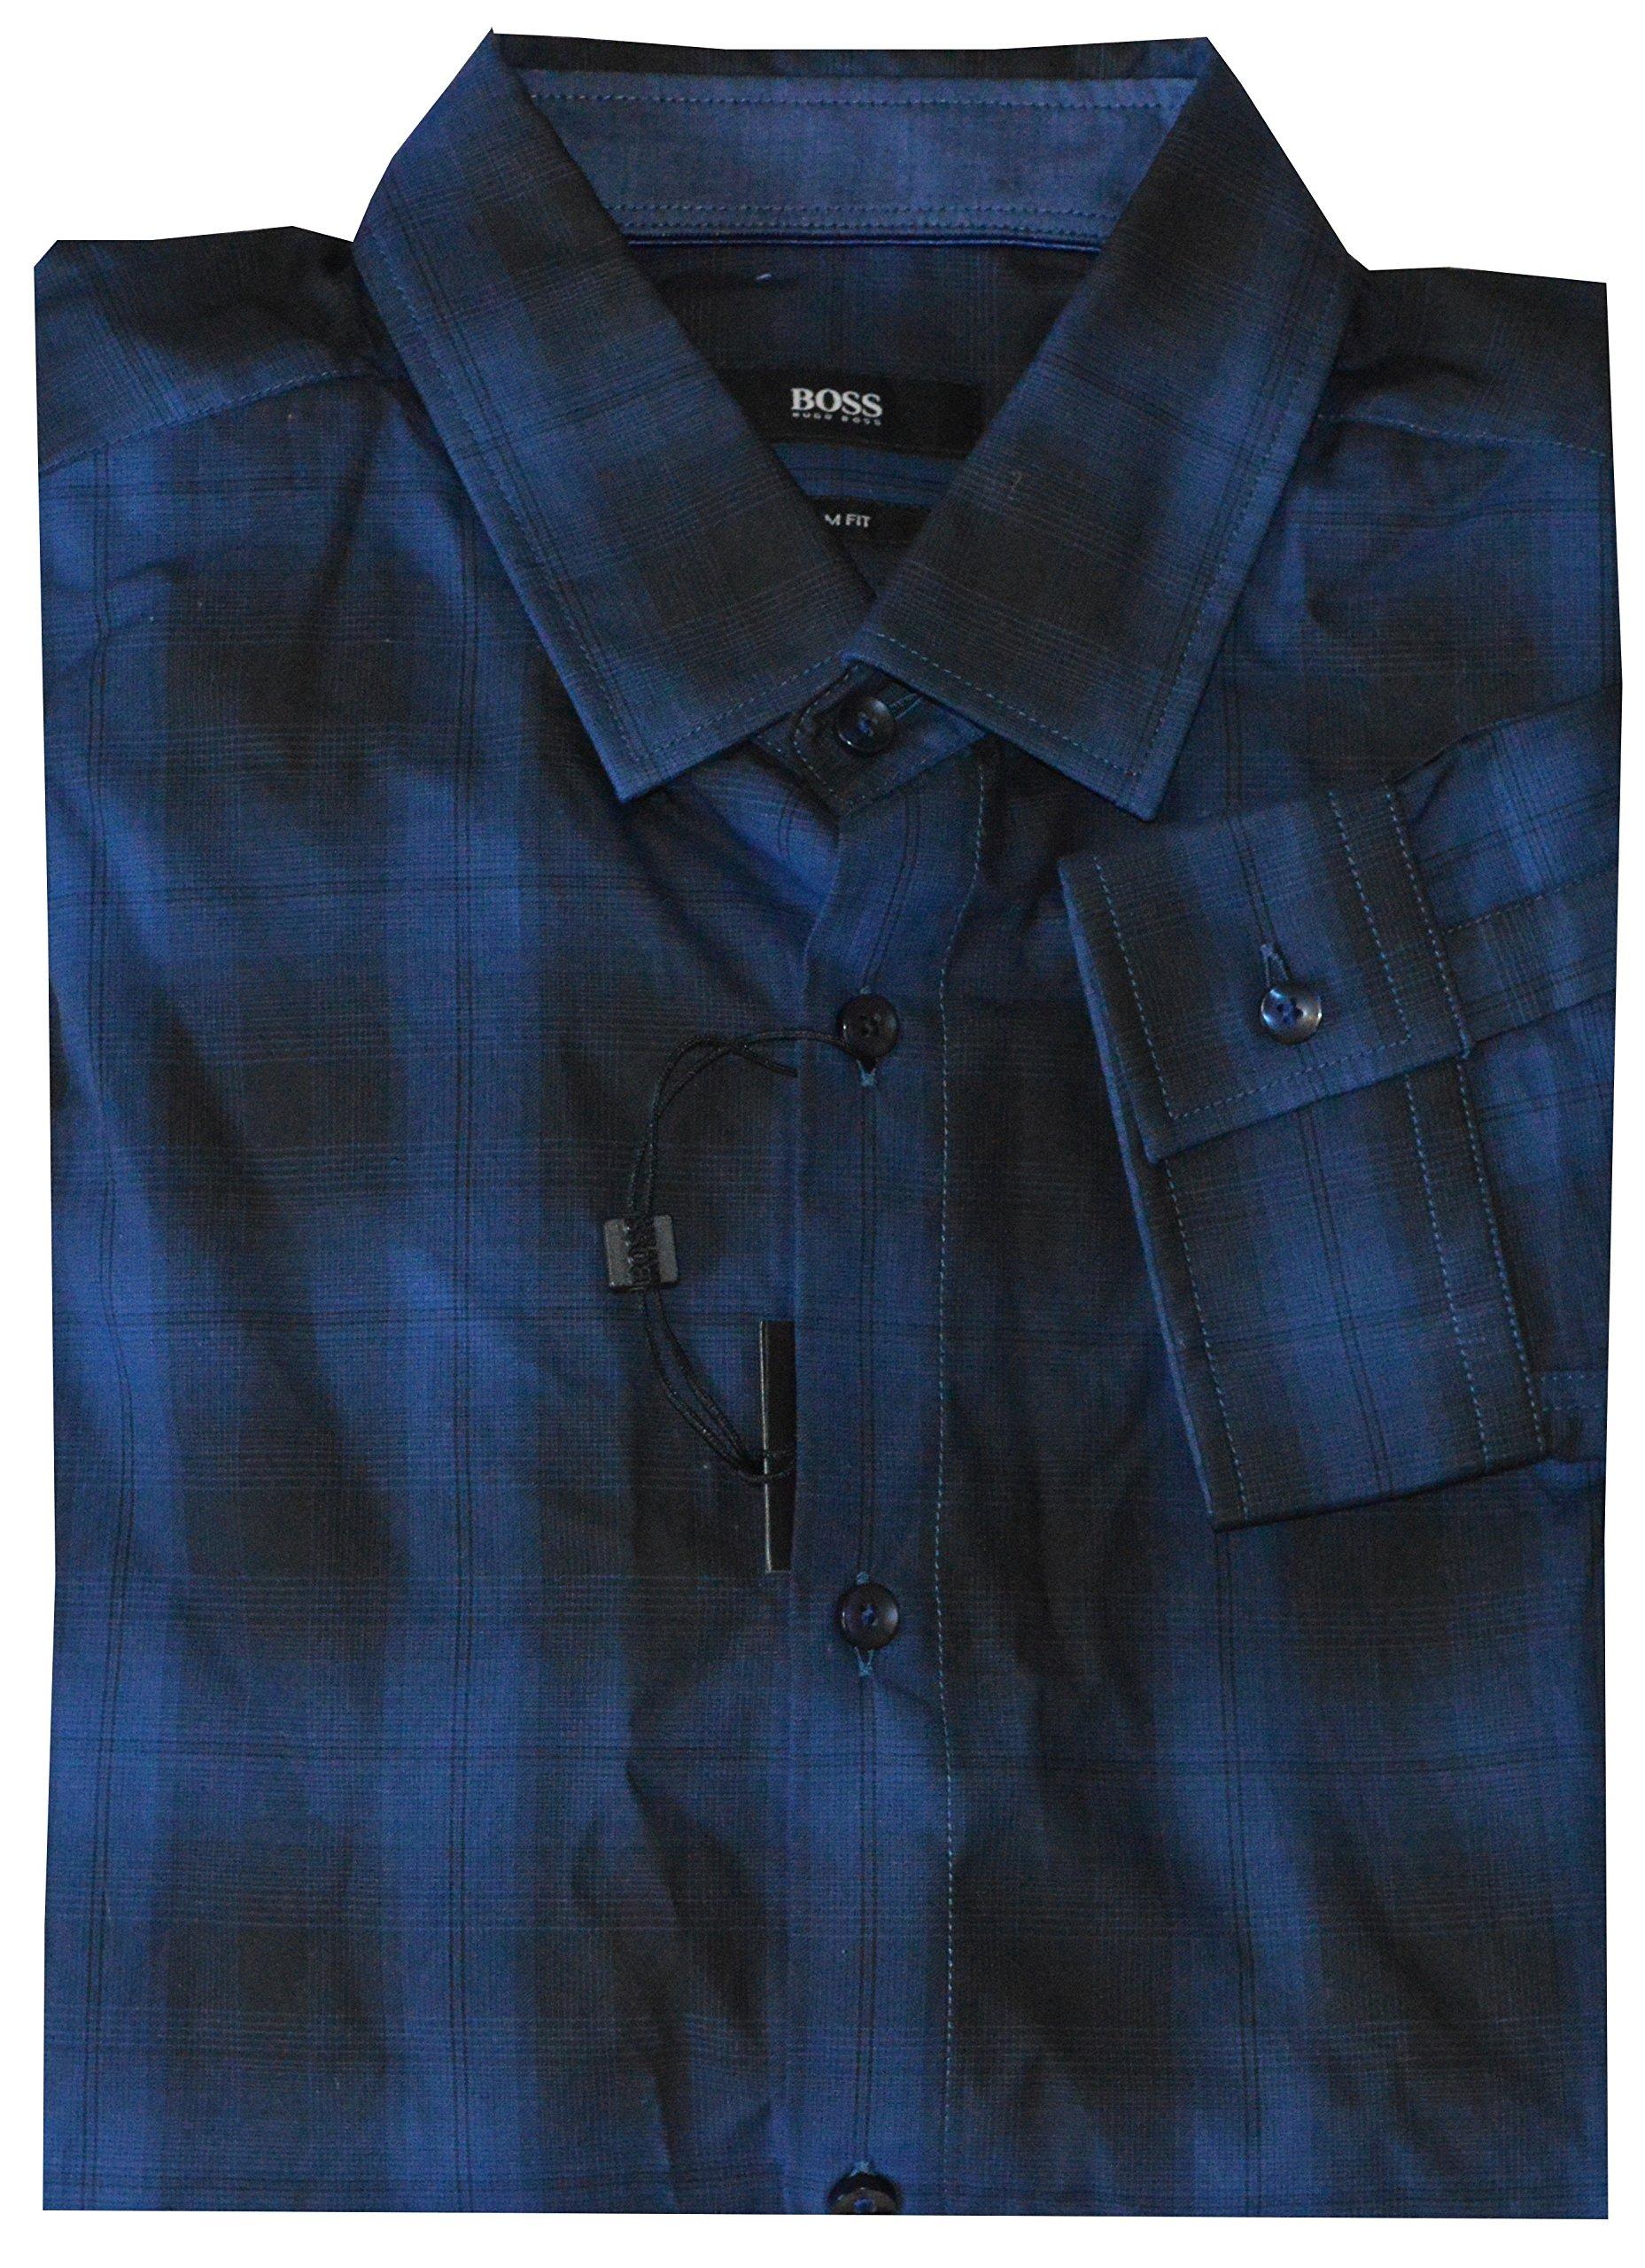 Hugo Boss Nemos Black Blue Plaid Slim Fit L/S Button Front Shirt Medium